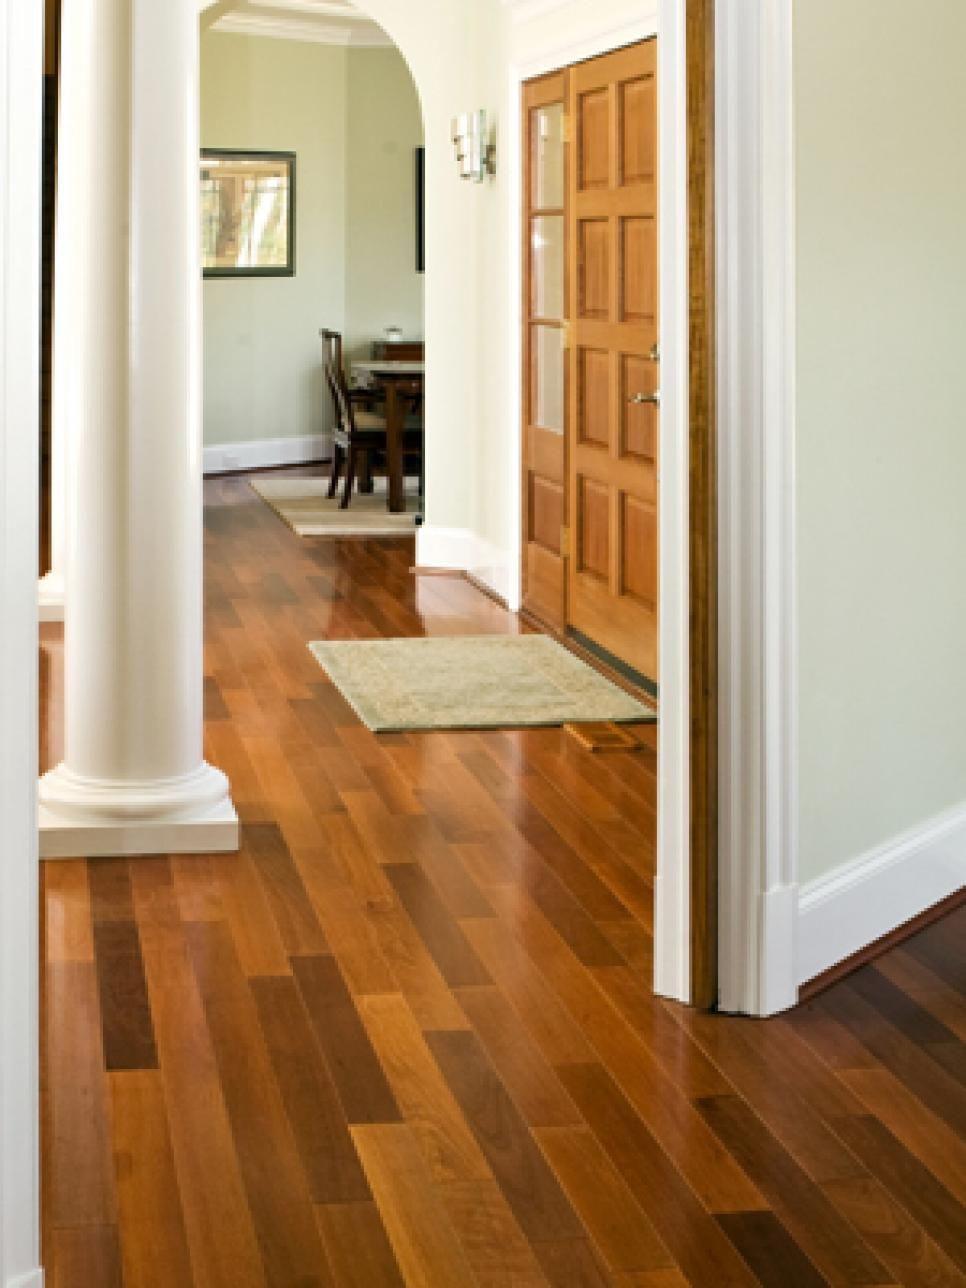 ottawa hardwood flooring stores of 10 stunning hardwood flooring options interior design styles and with regard to 10 stunning hardwood flooring options interior design styles and color schemes for home decorating